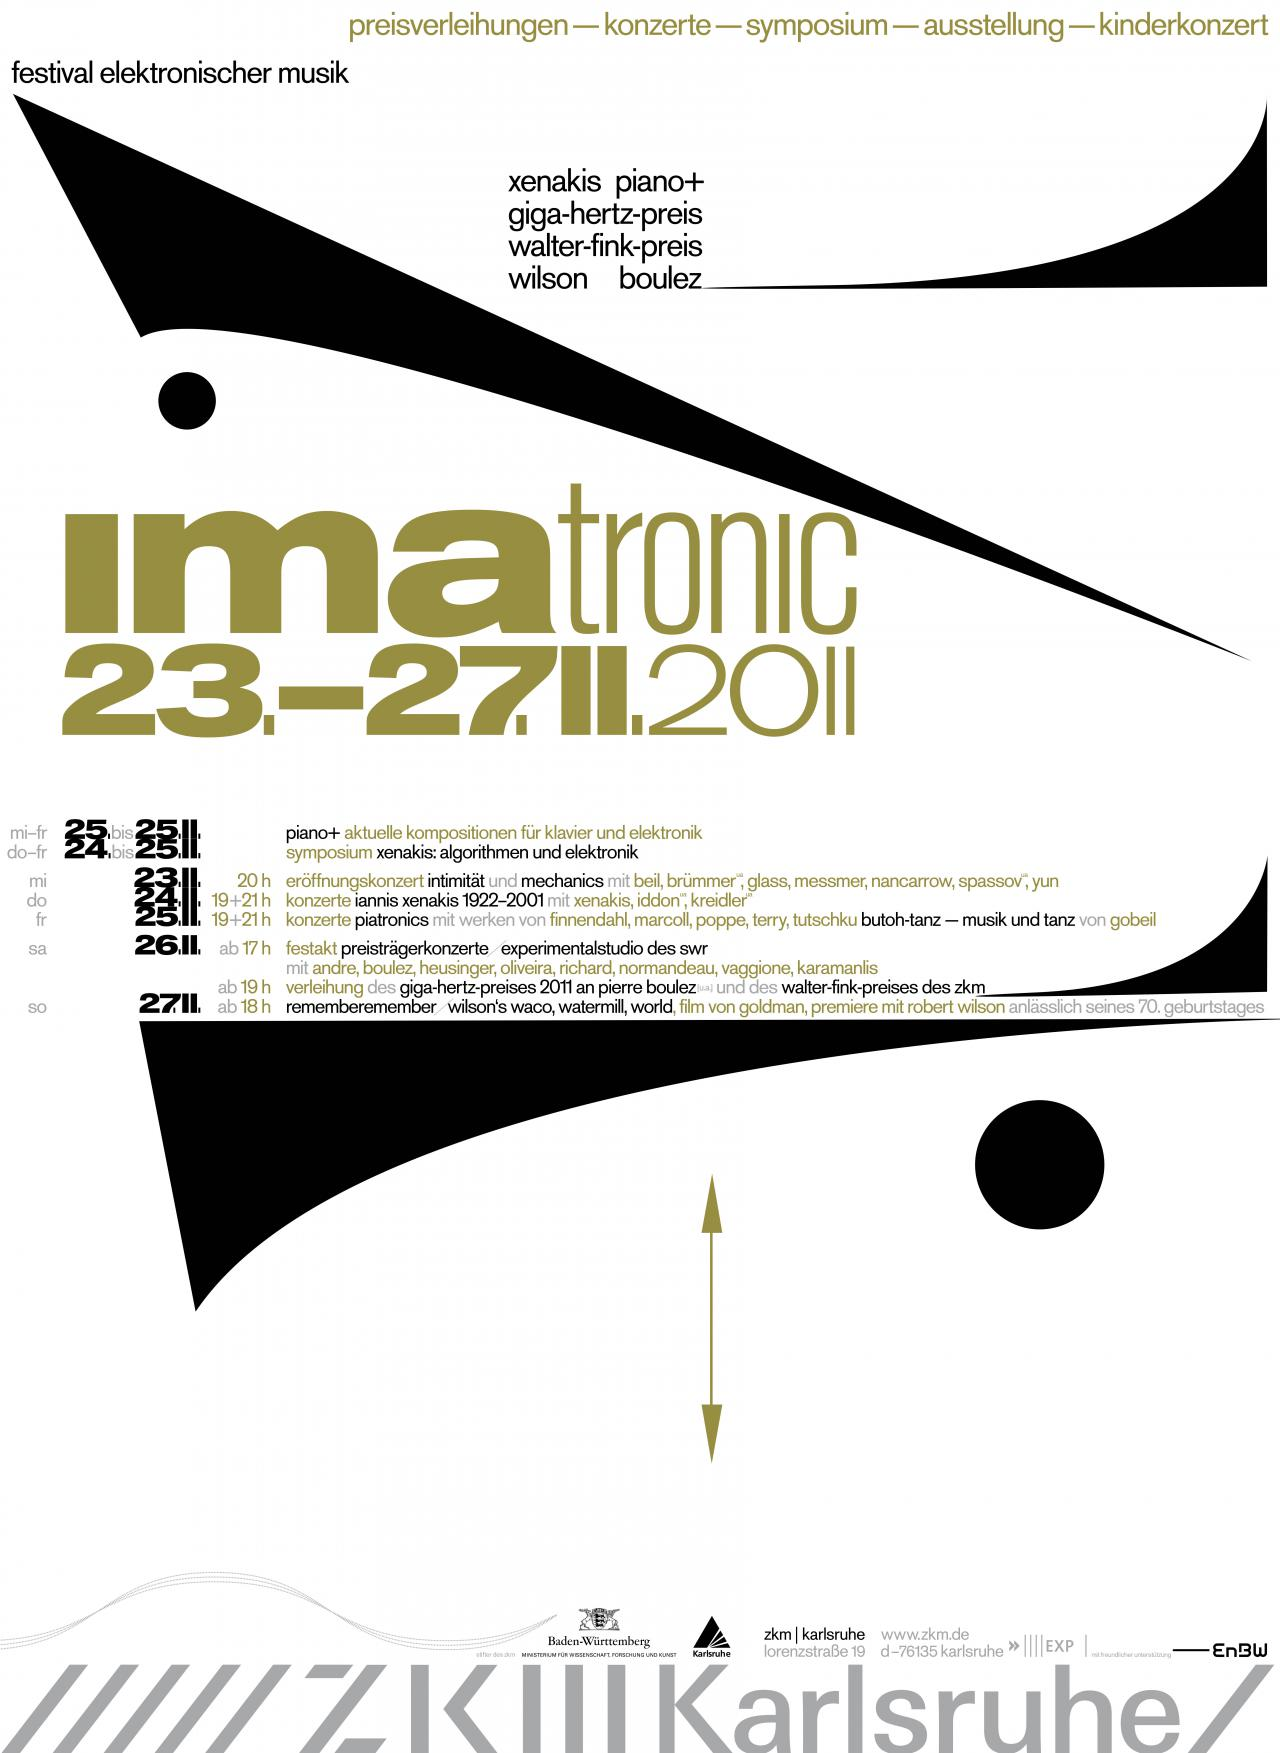 Poster IMATRONIC 2011 at ZKM | Karlsruhe